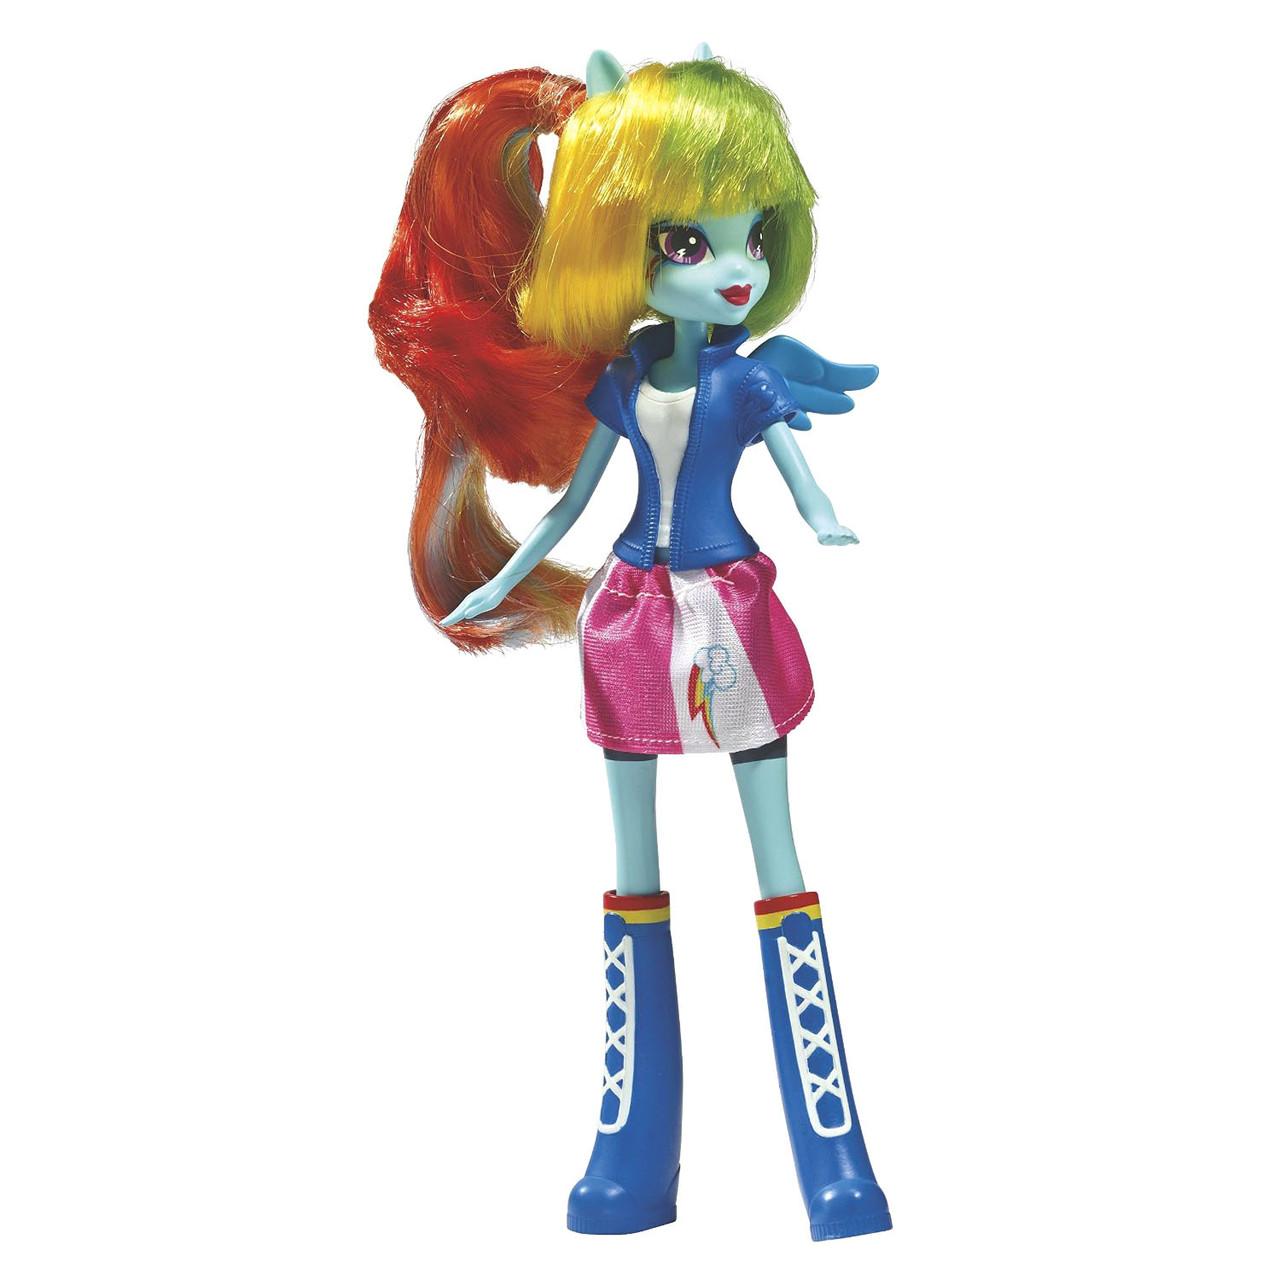 My Little Pony Лялька Еквестрія Рейнбов Деш (Equestria Girls Rainbow Dash  Кукла Эквестрия Радуга)